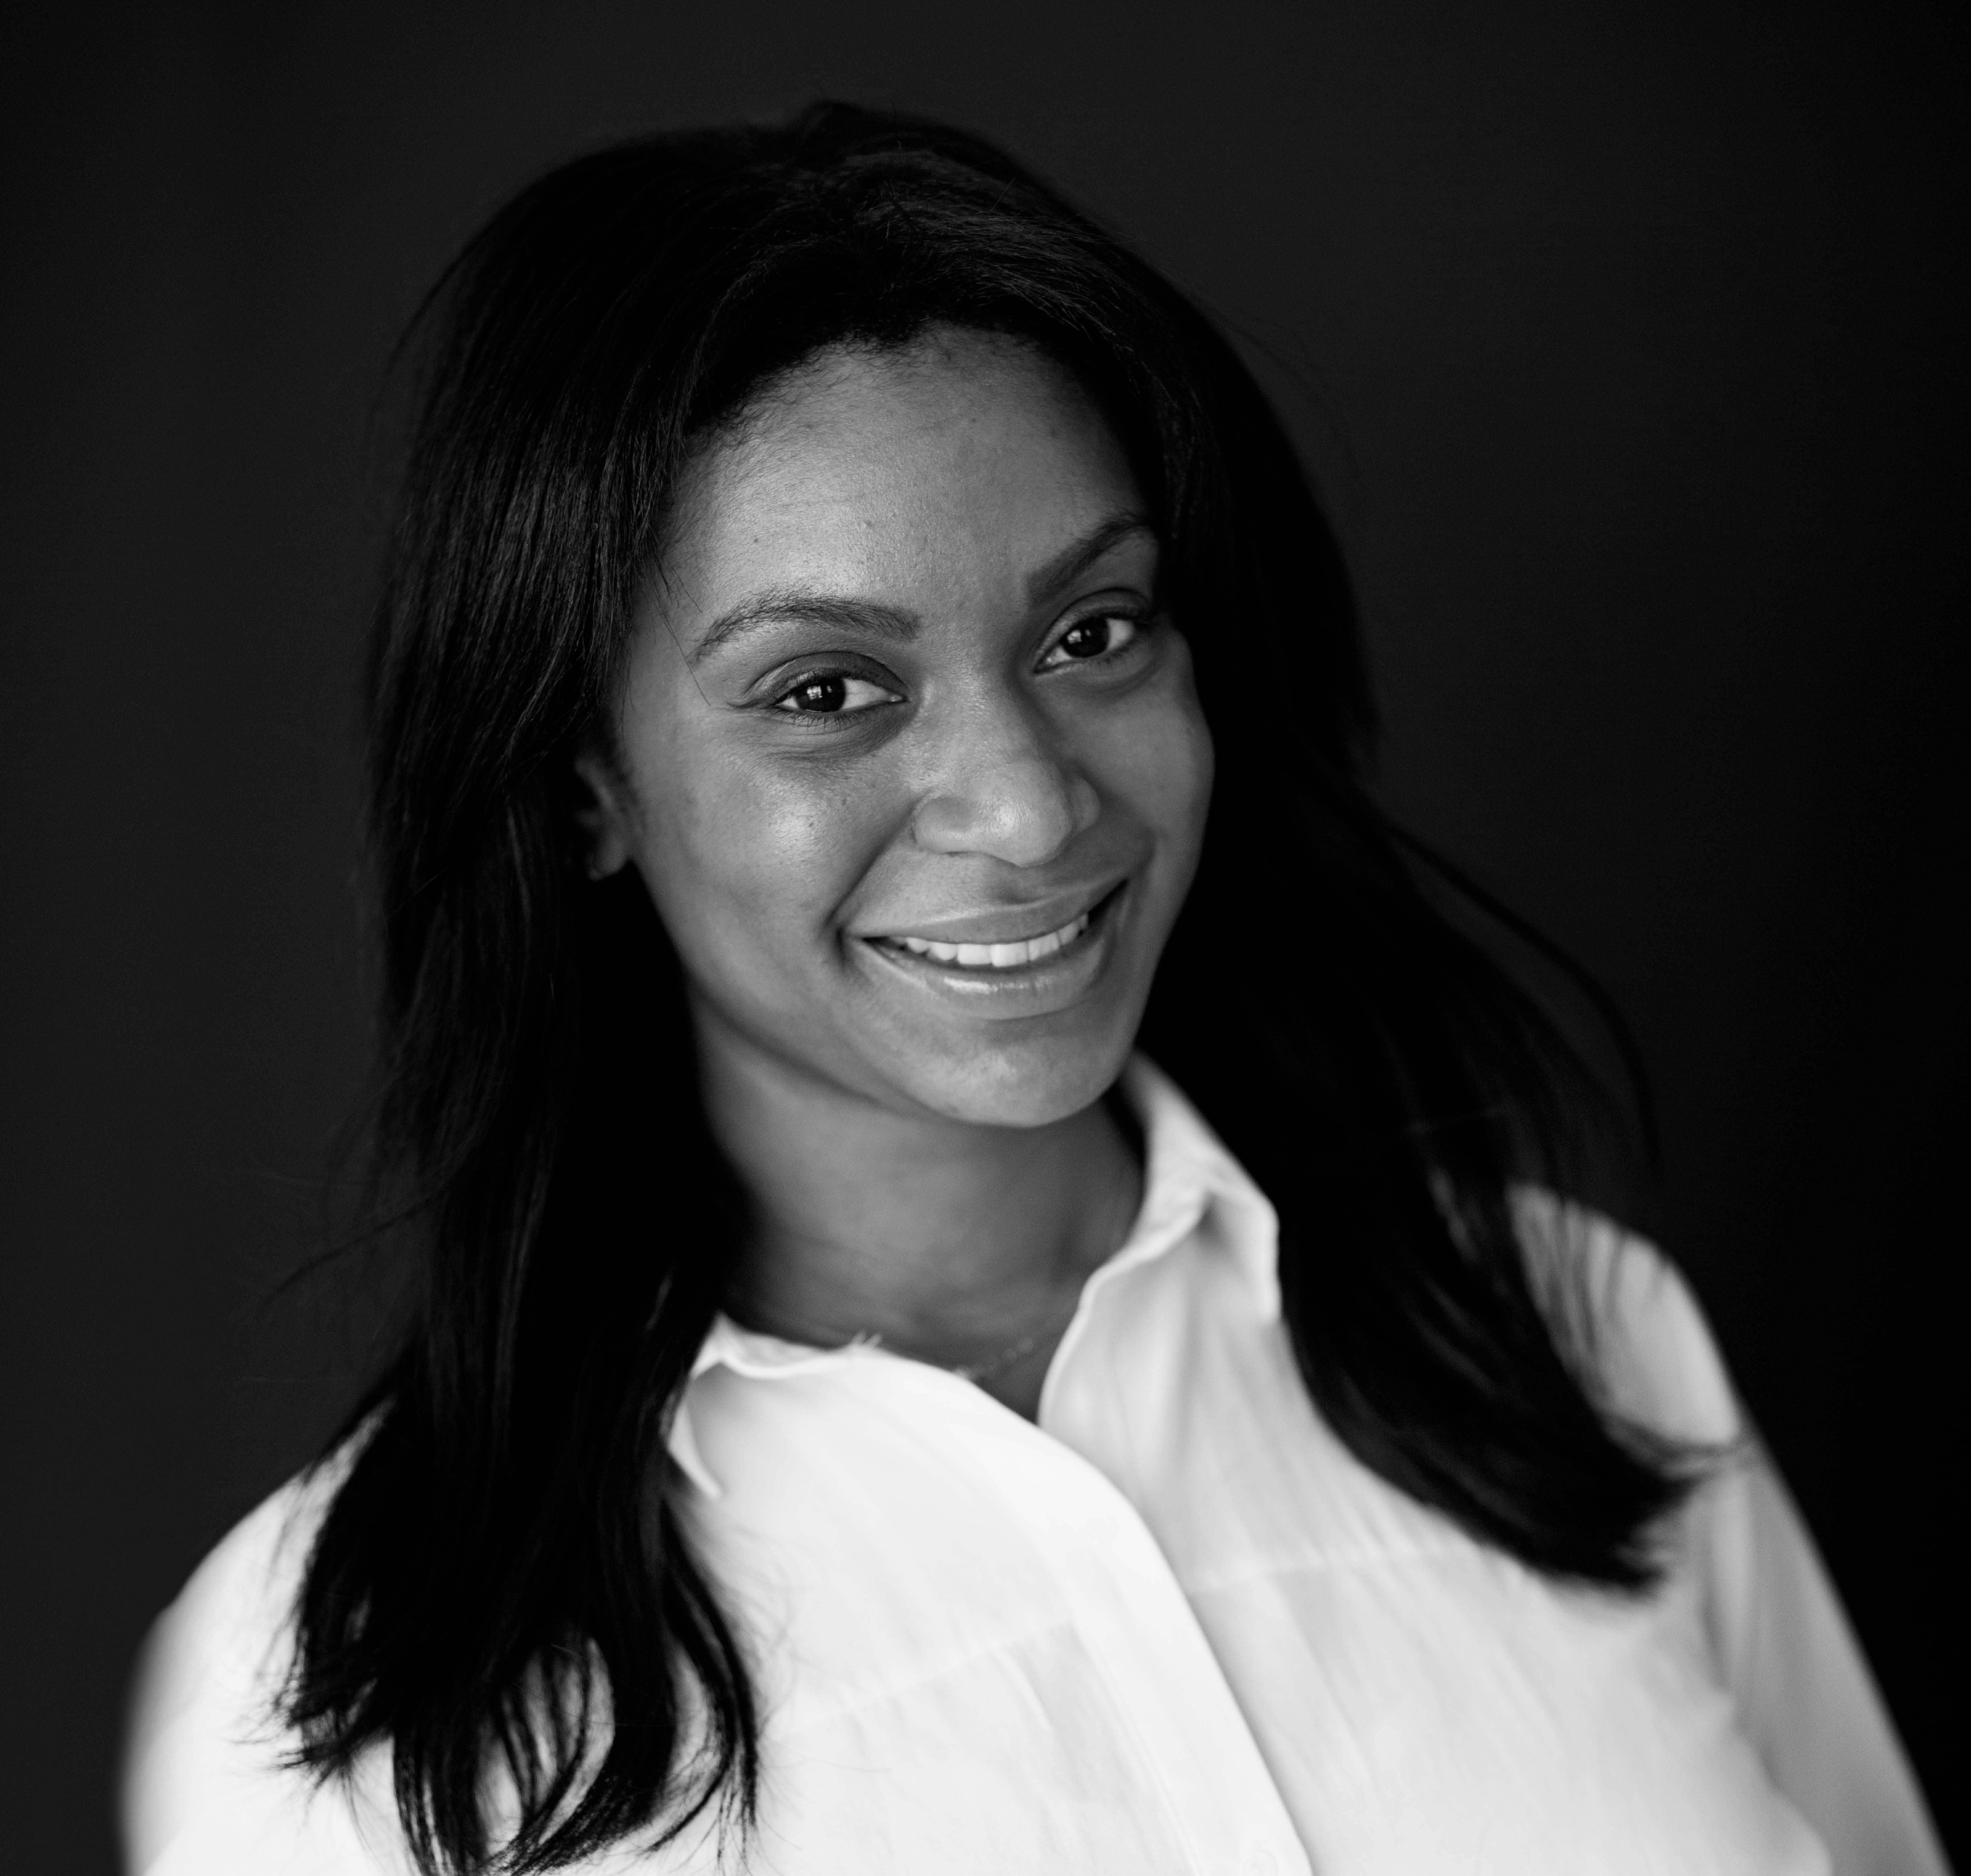 Naomi Archibald